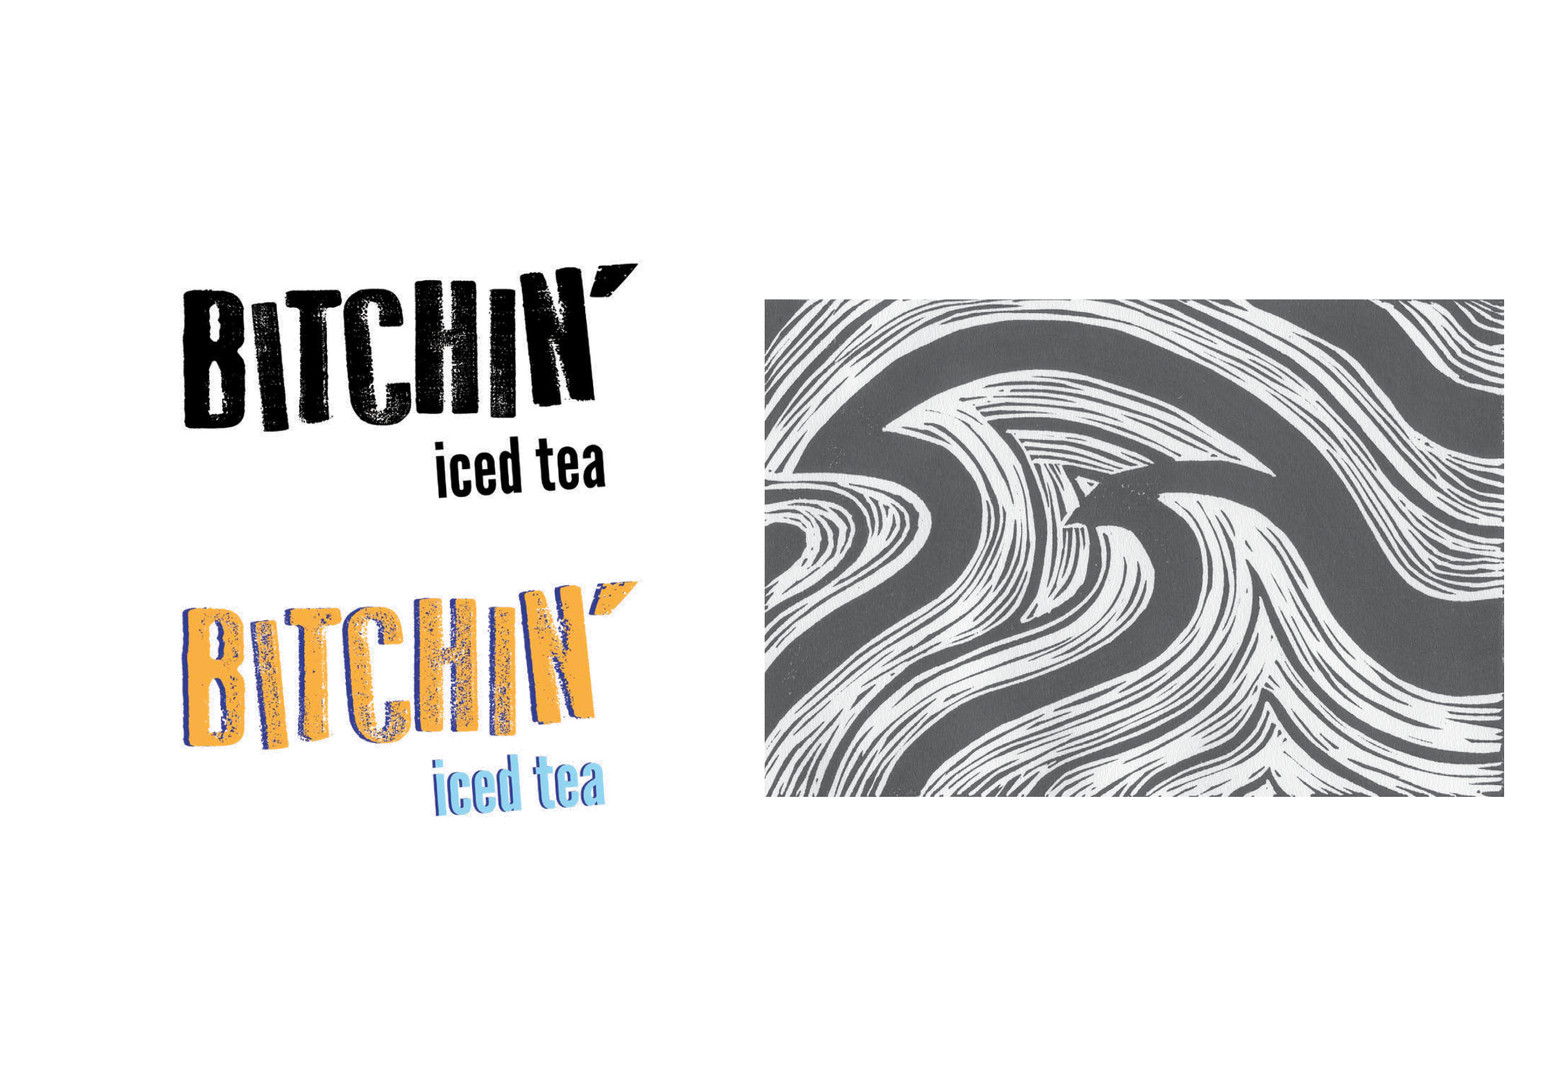 Bitchin' Iced Tea Branding